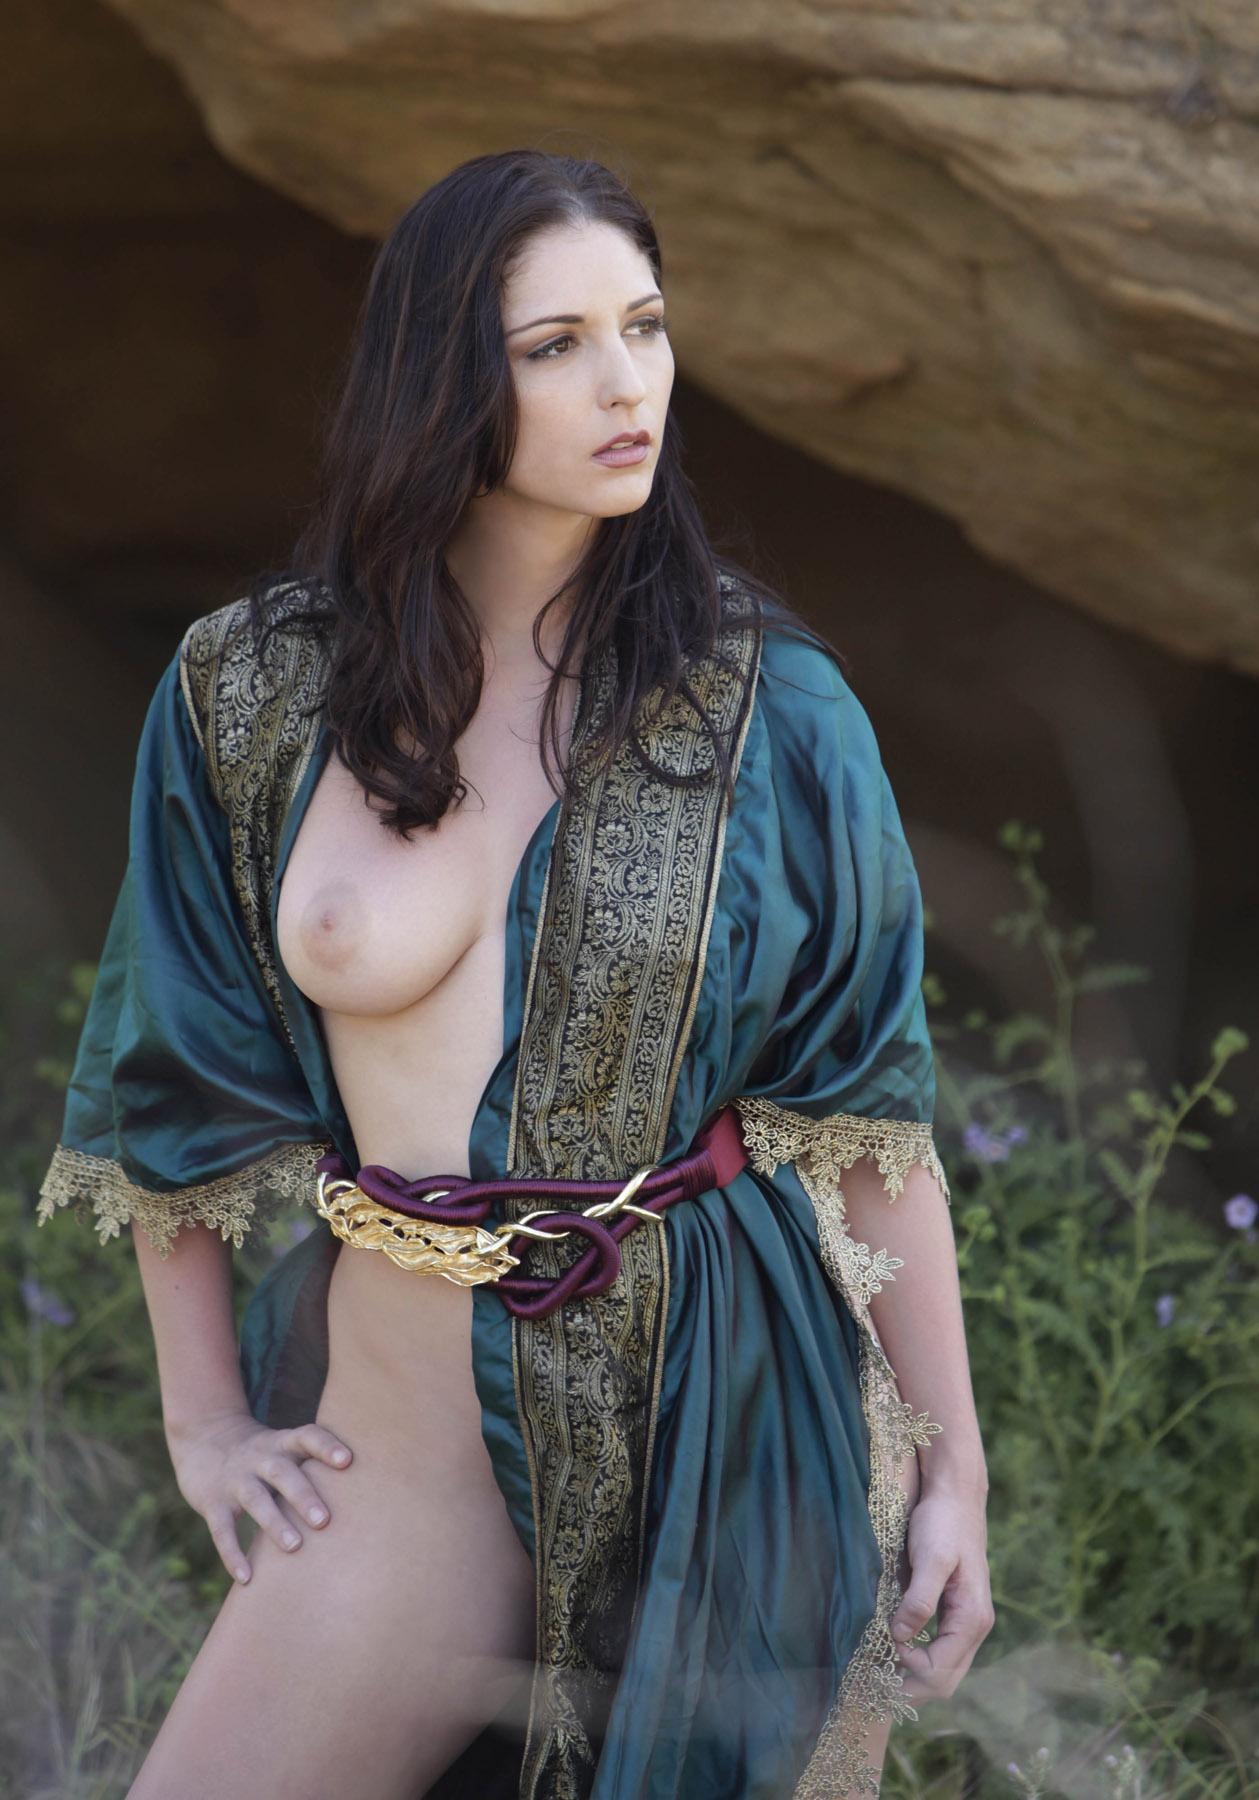 Bare maidens seems good